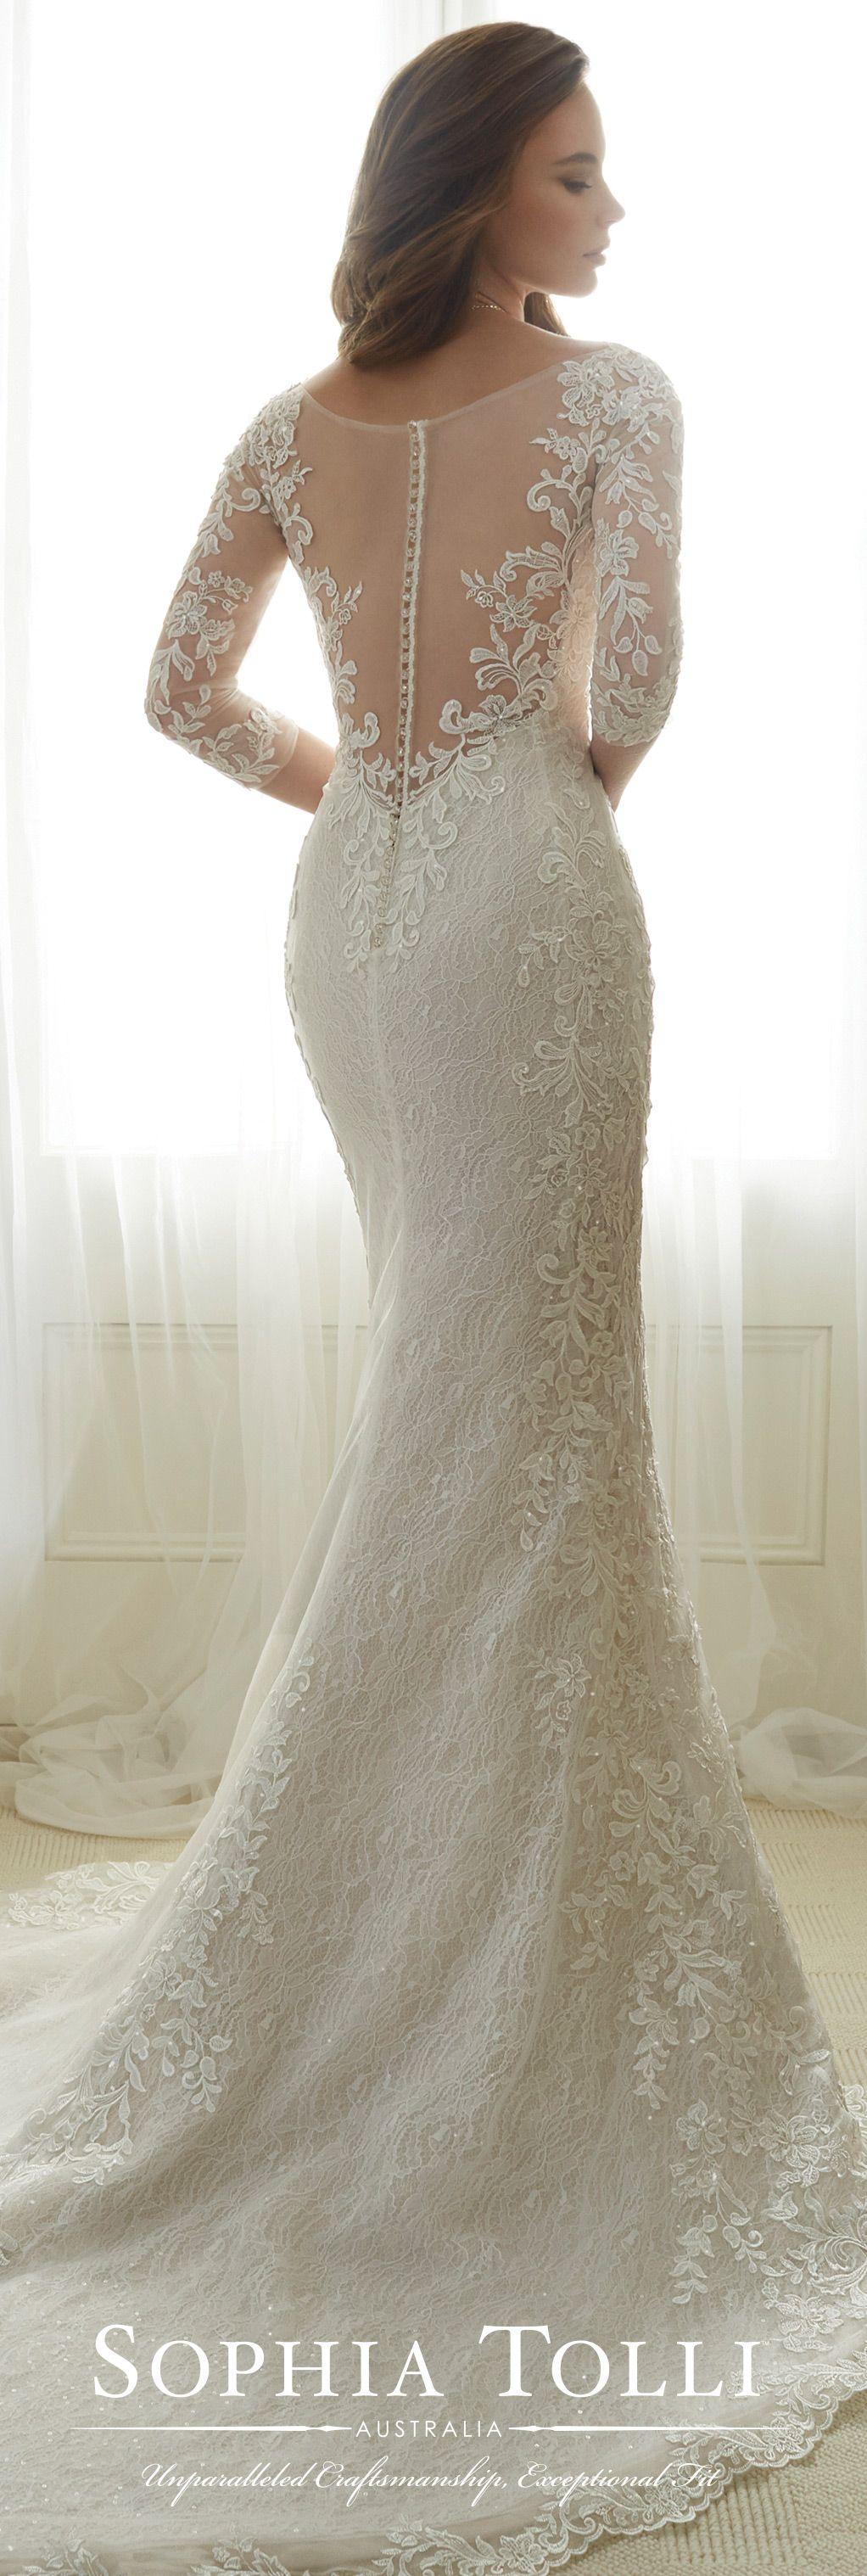 3/4 length lace wedding dress  Tulle Soft Trumpet Wedding Gown  Sophia Tolli Y  Wedding